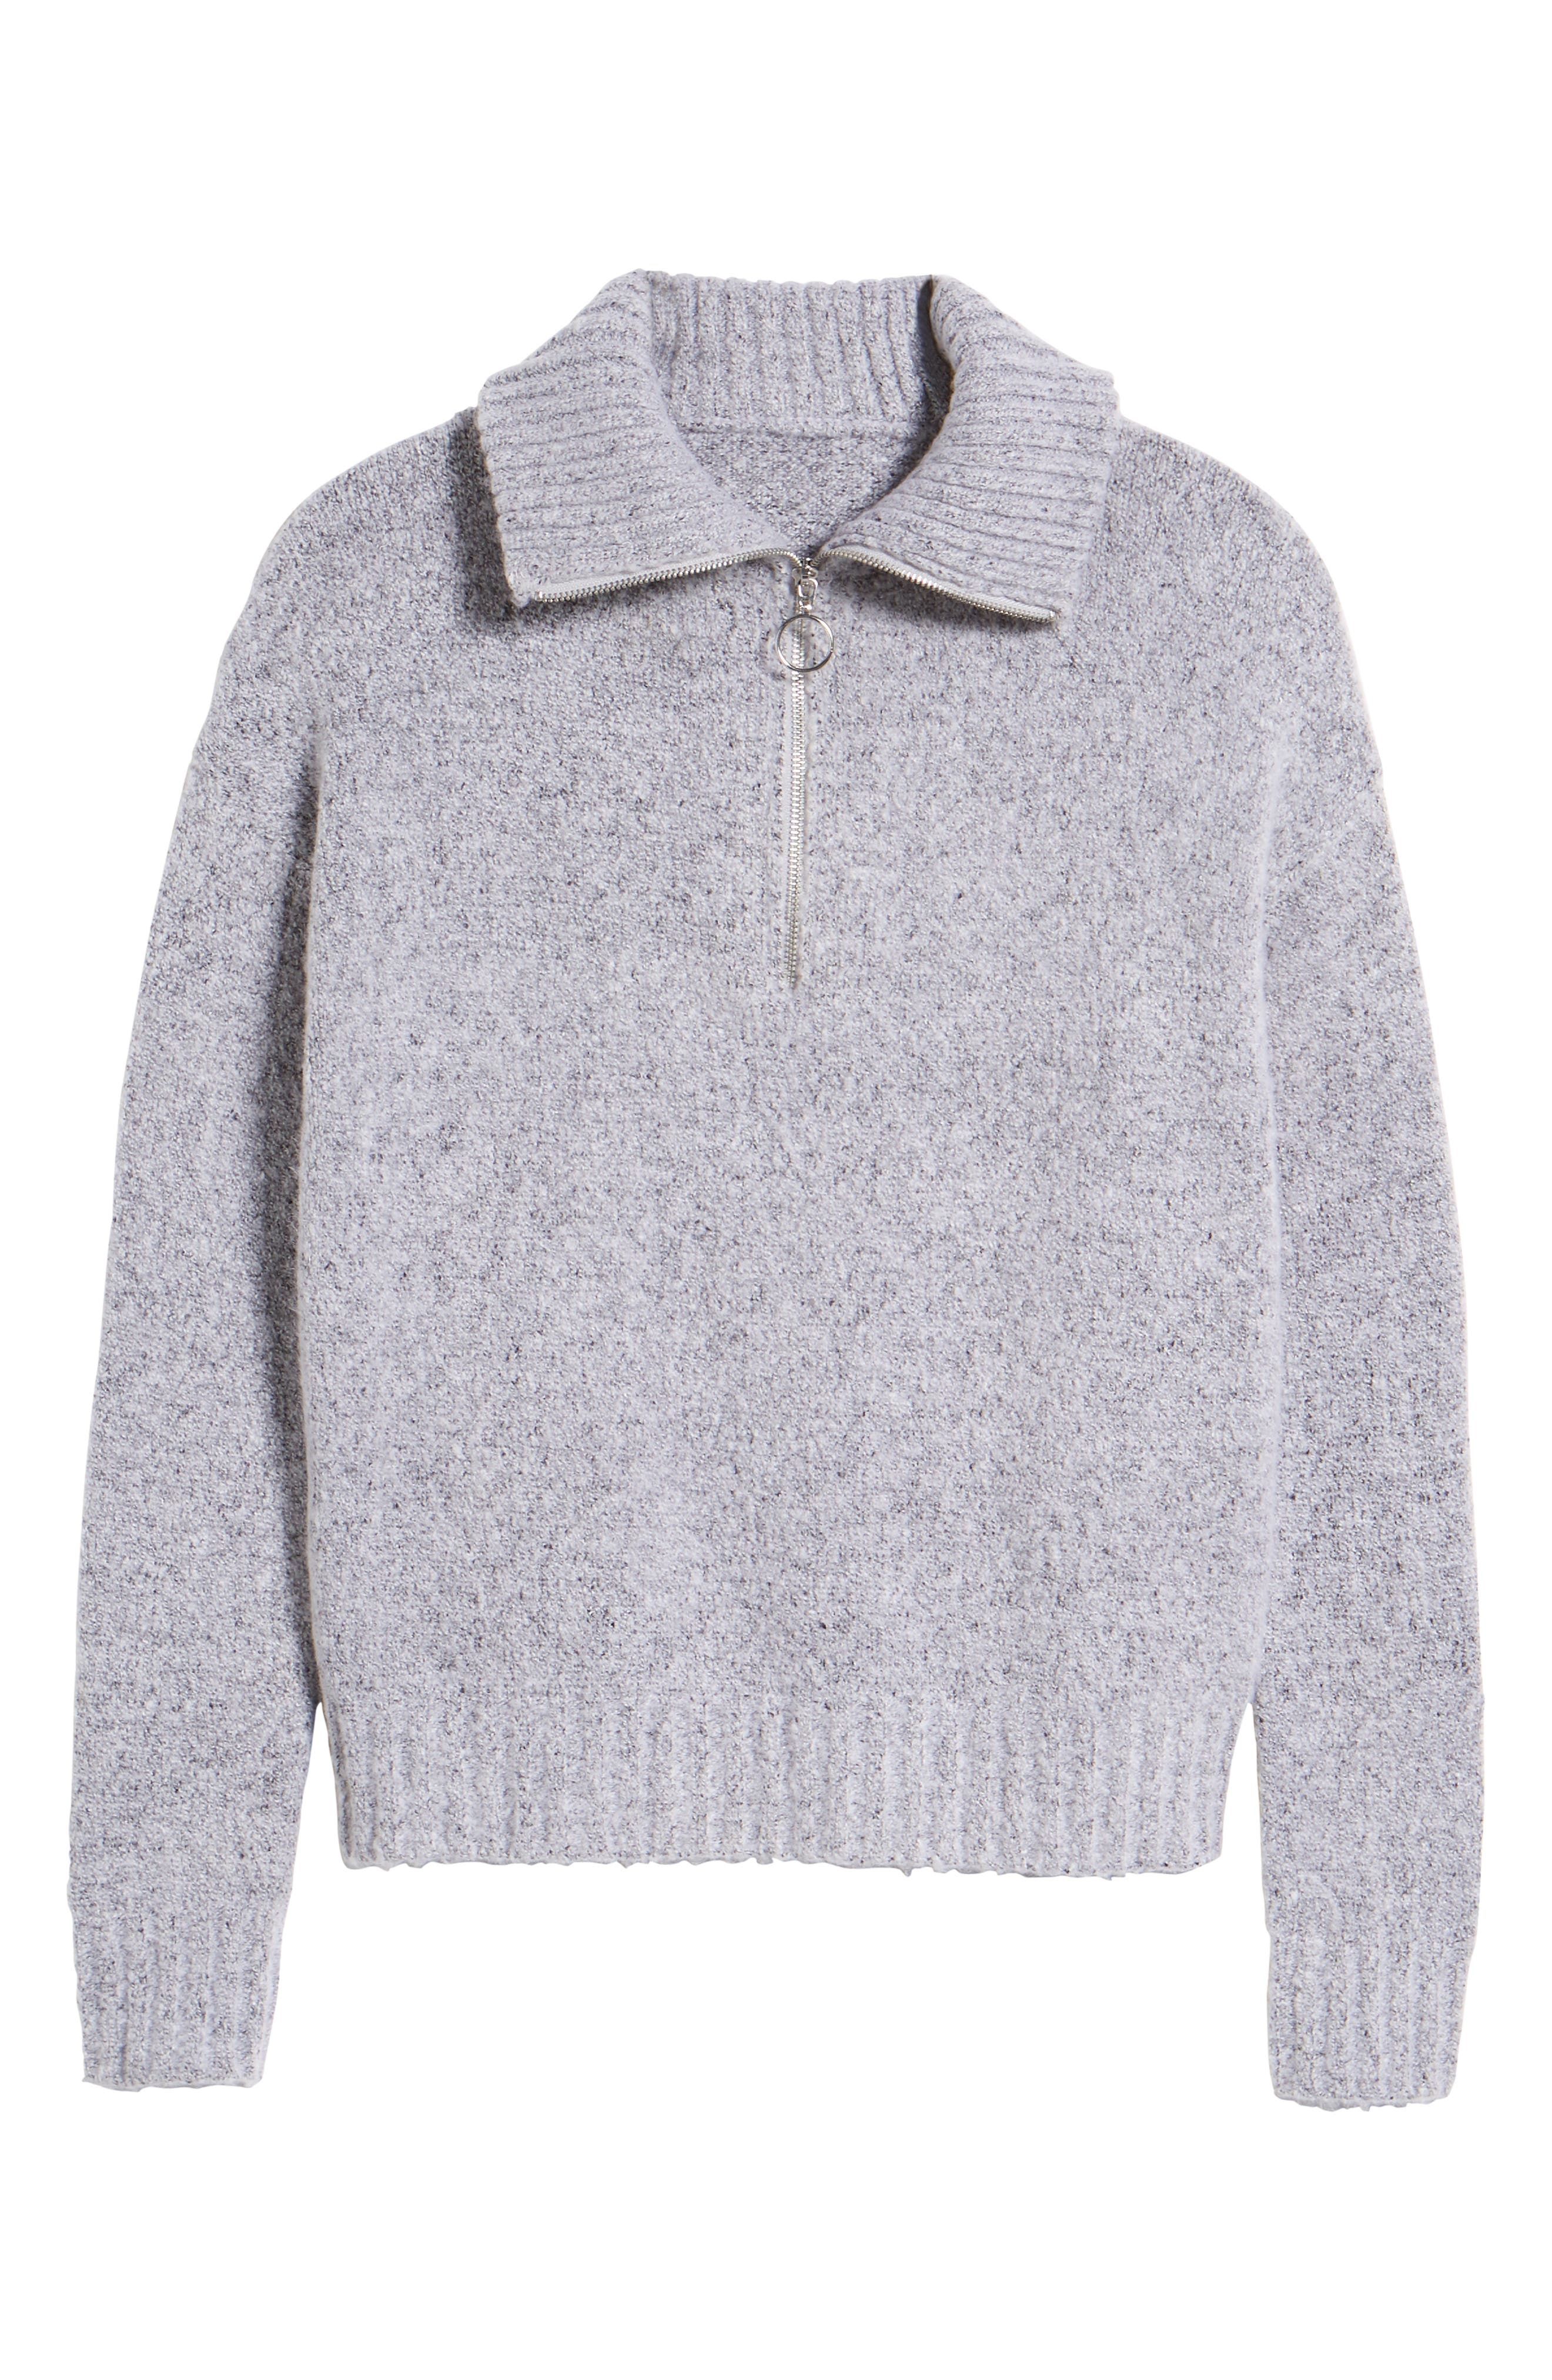 Quarter Zip Sweater,                             Alternate thumbnail 7, color,                             020